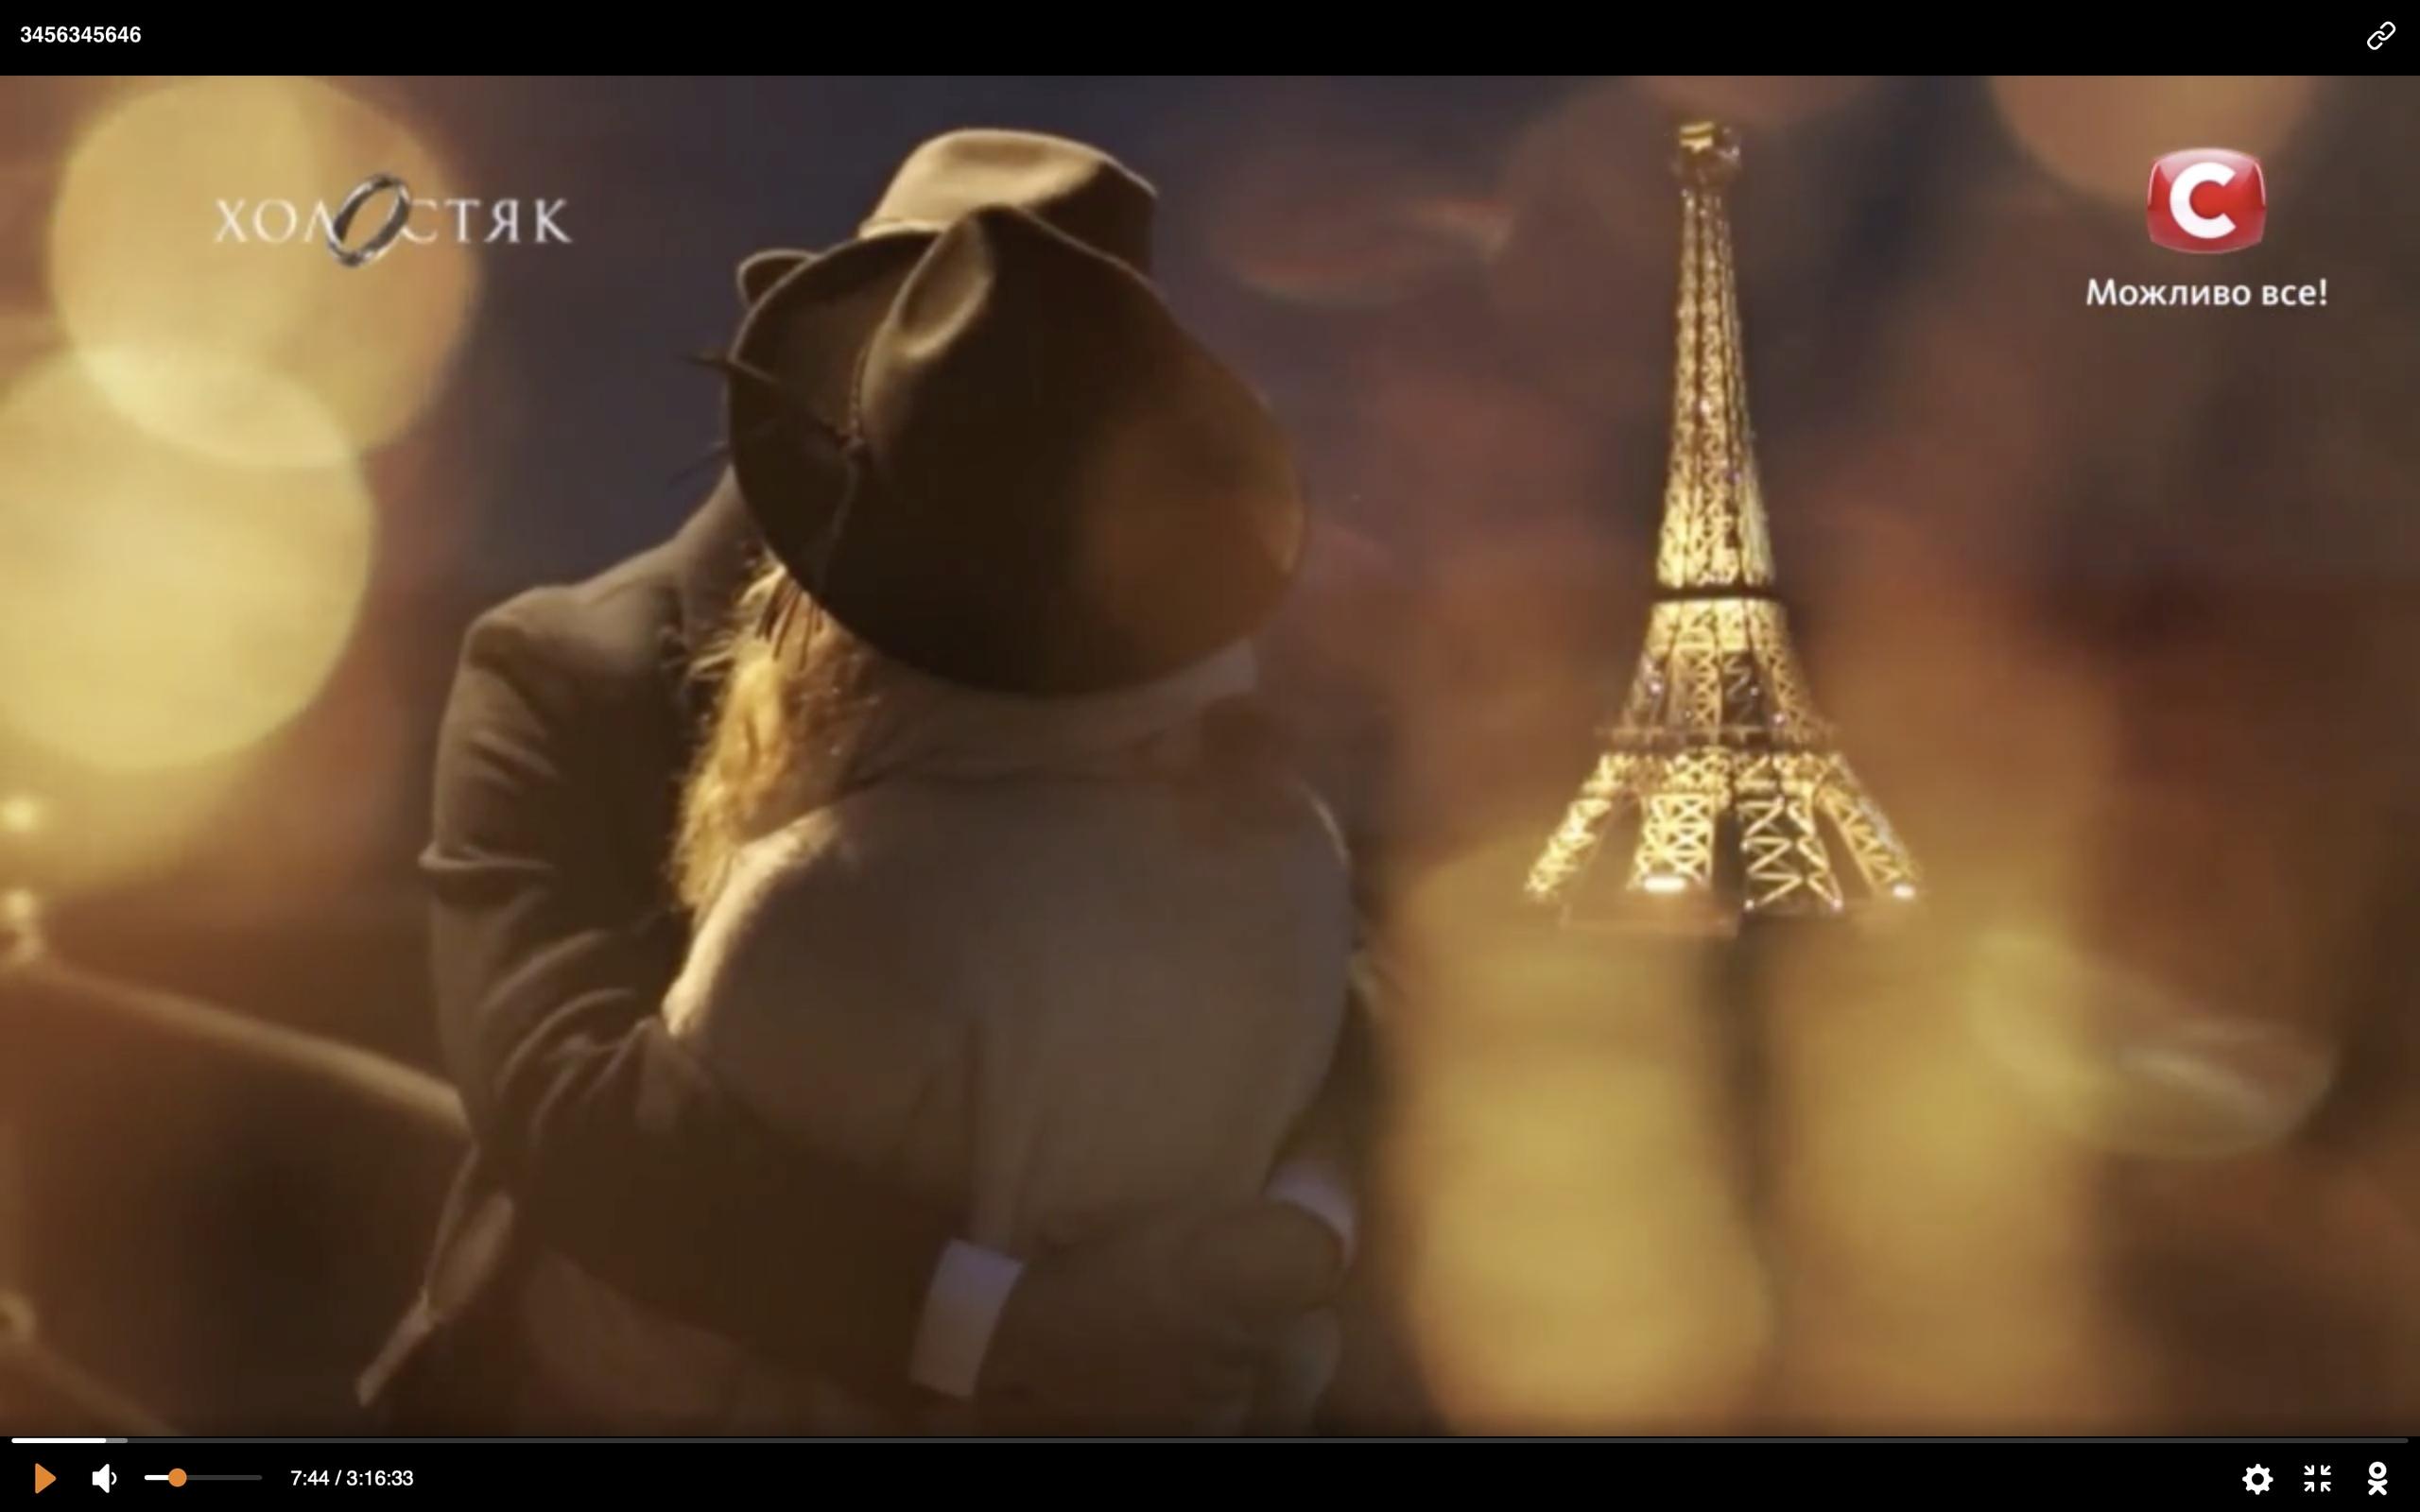 Bachelor Ukraine - Season 9 - Nikita Dobrynin - *Sleuthing Spoilers* - Page 10 RU71n6cSxks